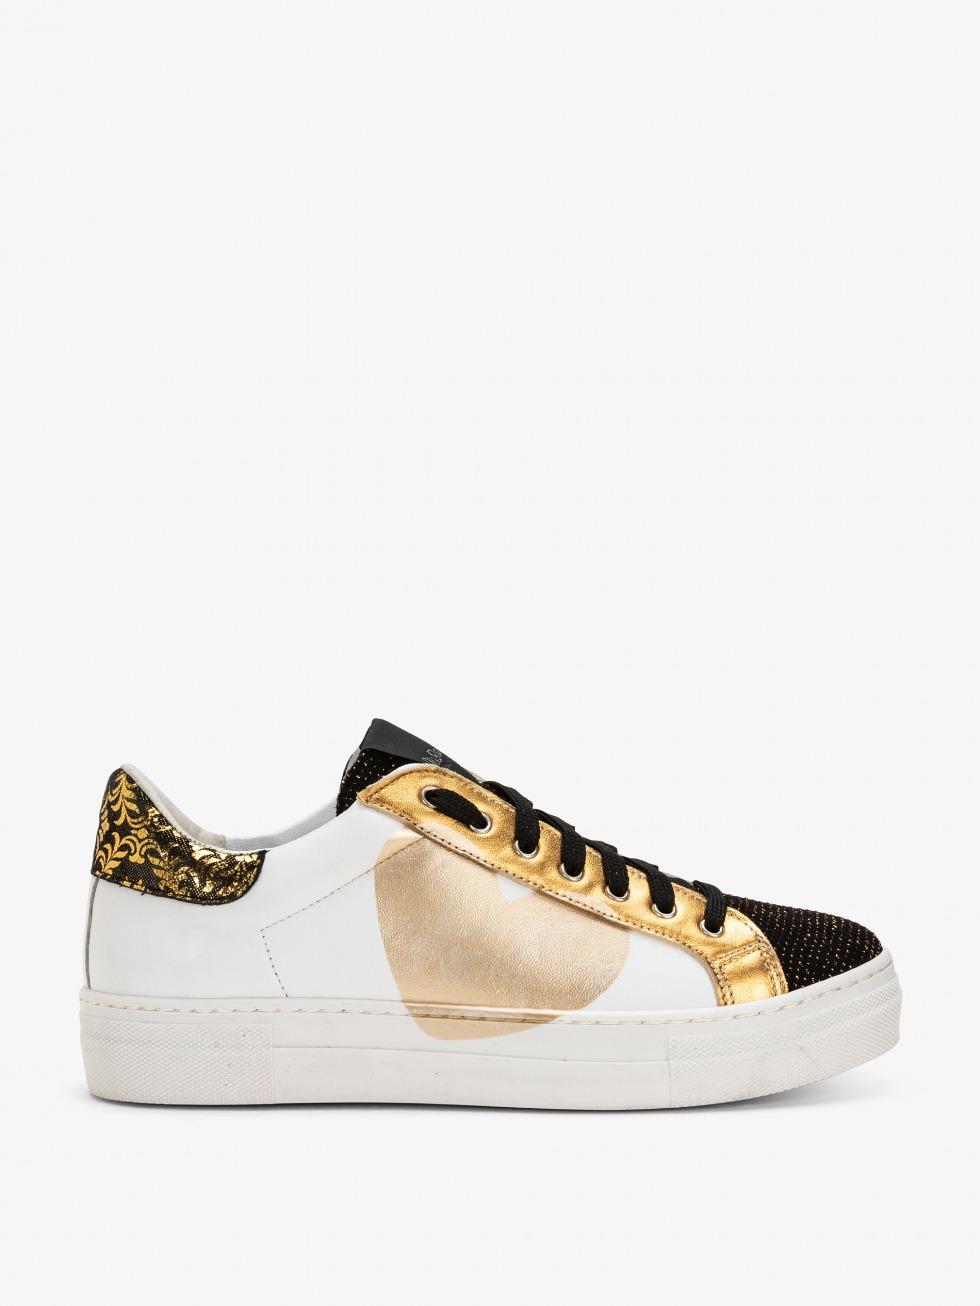 Sneakers Martini Bianco Luxury Gold - Cuore